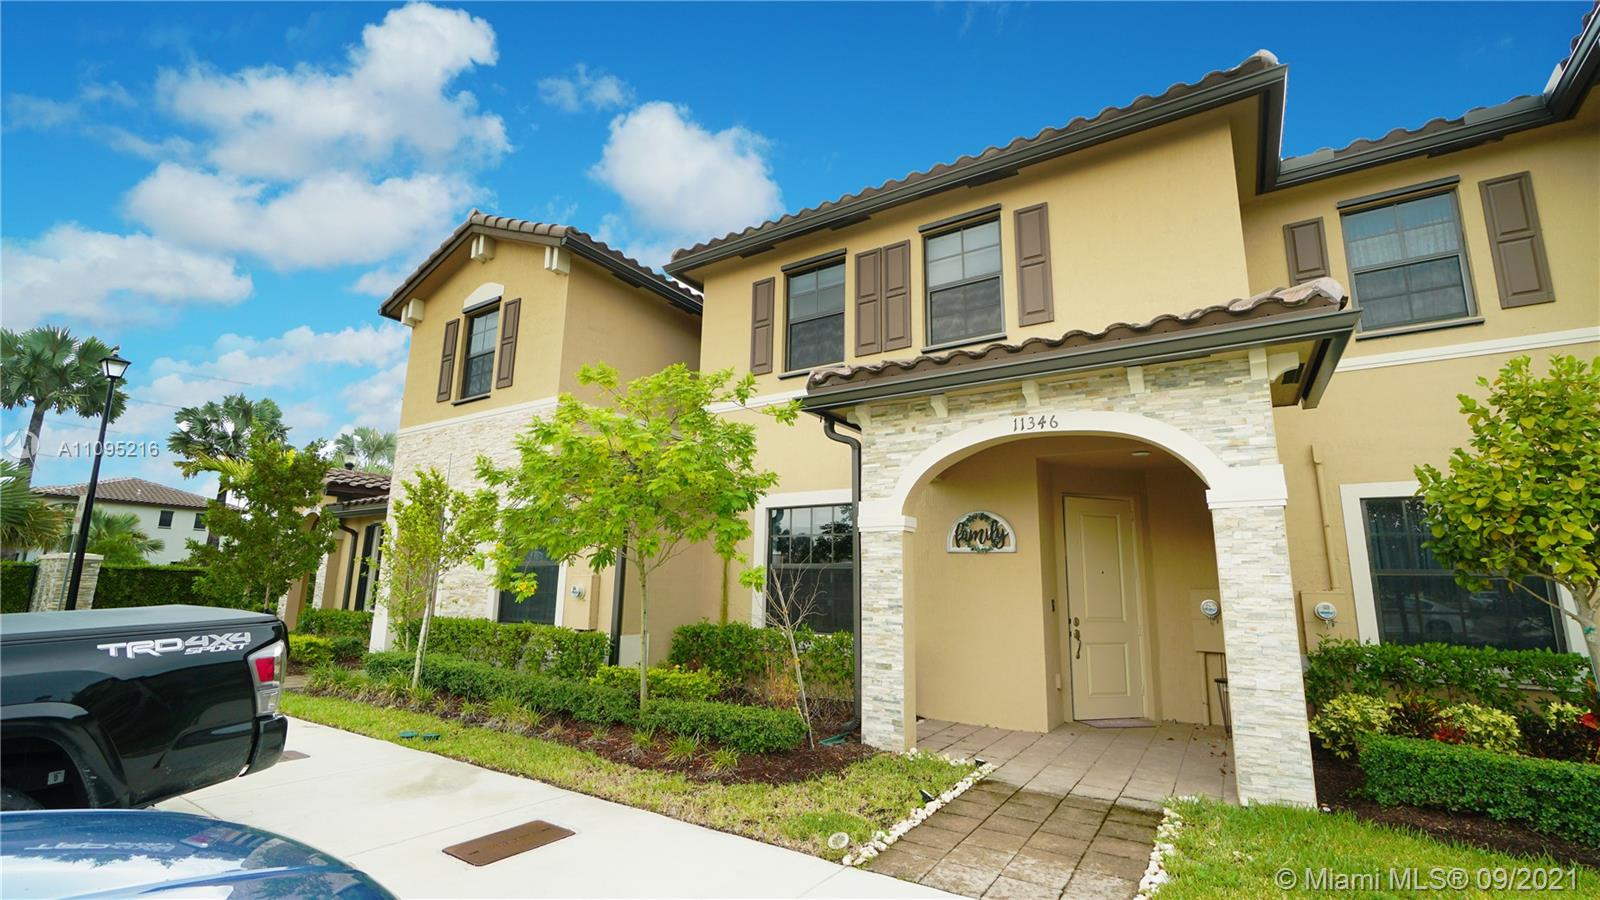 11346 Sw 249th St Property Photo